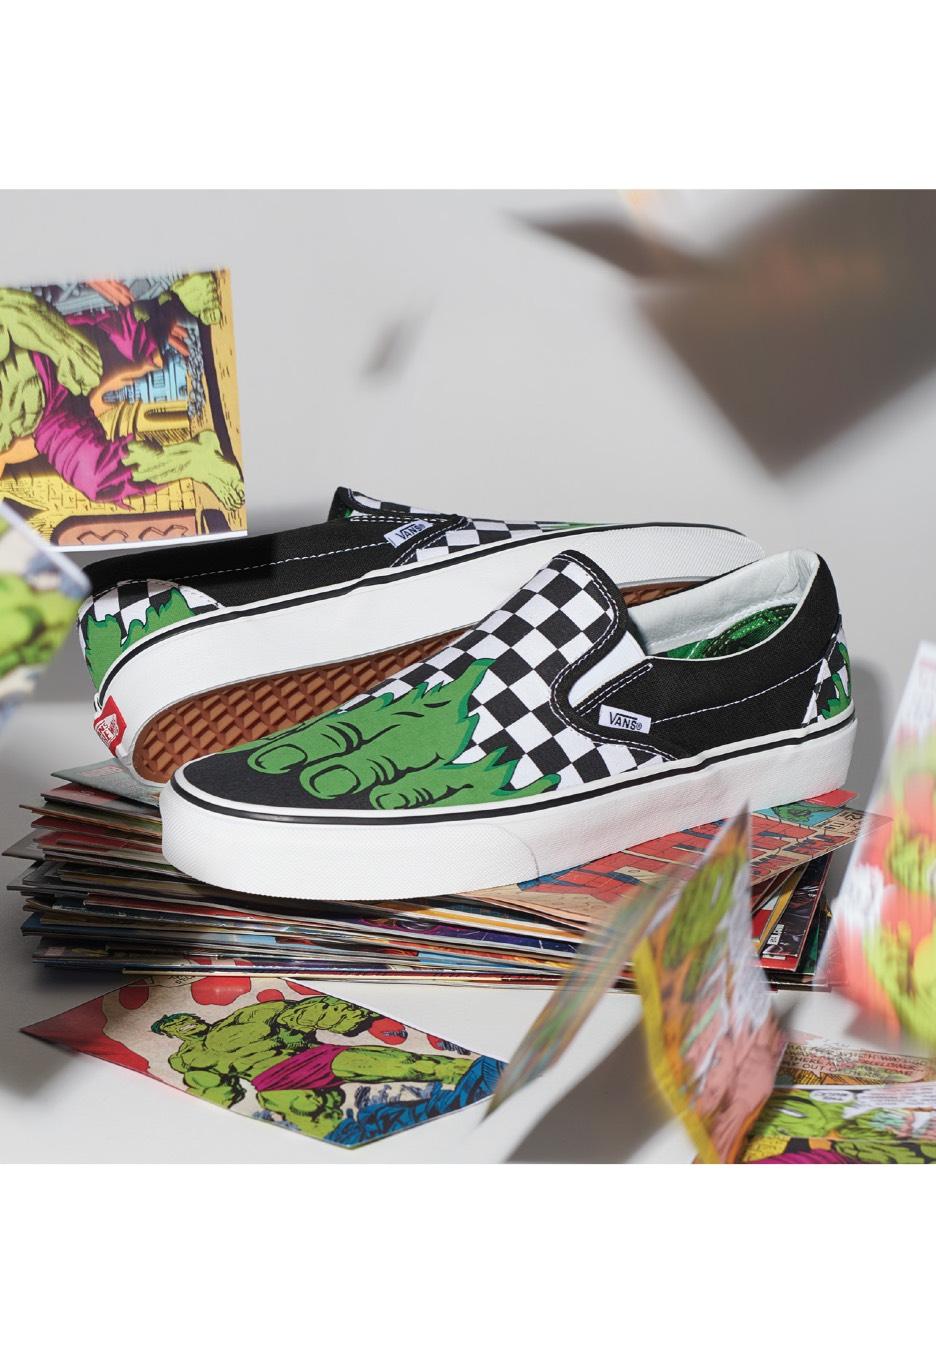 vans x marvel classic slip-on shoes